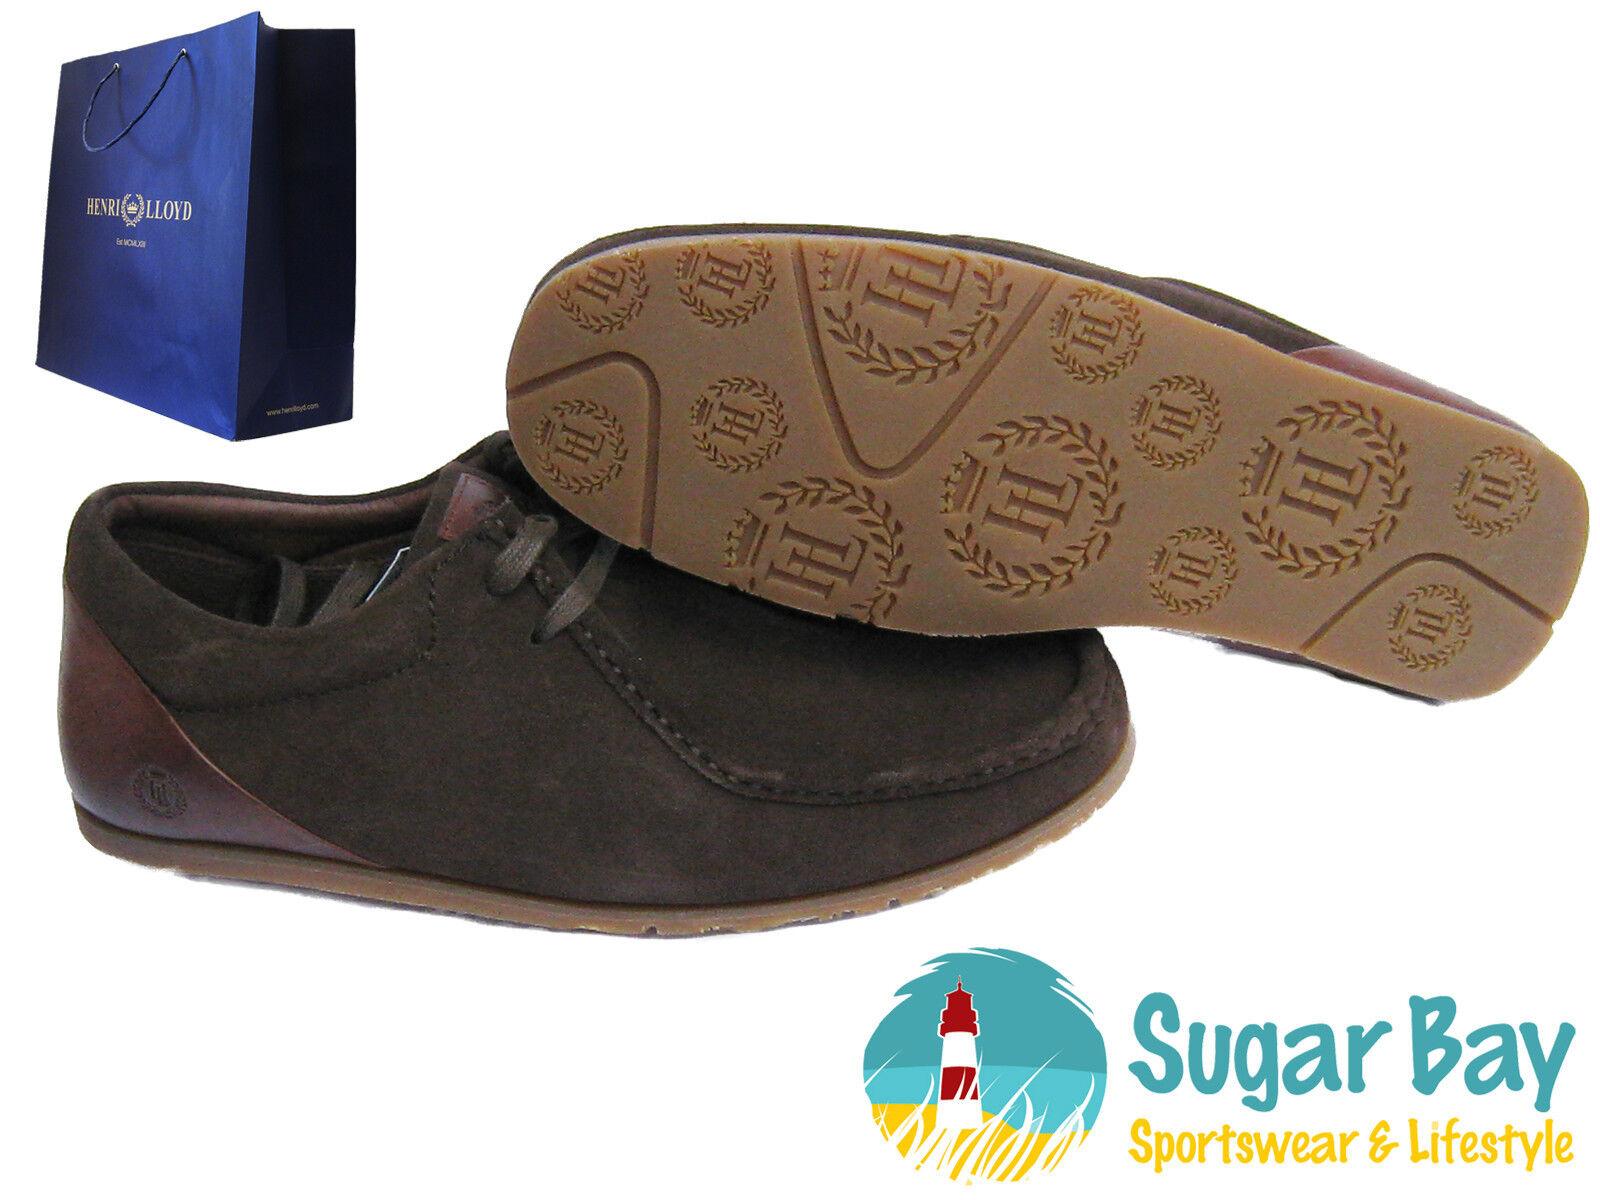 New HENRI LLOYD MENS STUD G2 Leather MOCCASINS Size Dark Brown Shoe UK Size MOCCASINS 8 Eu 42 cb9bd2